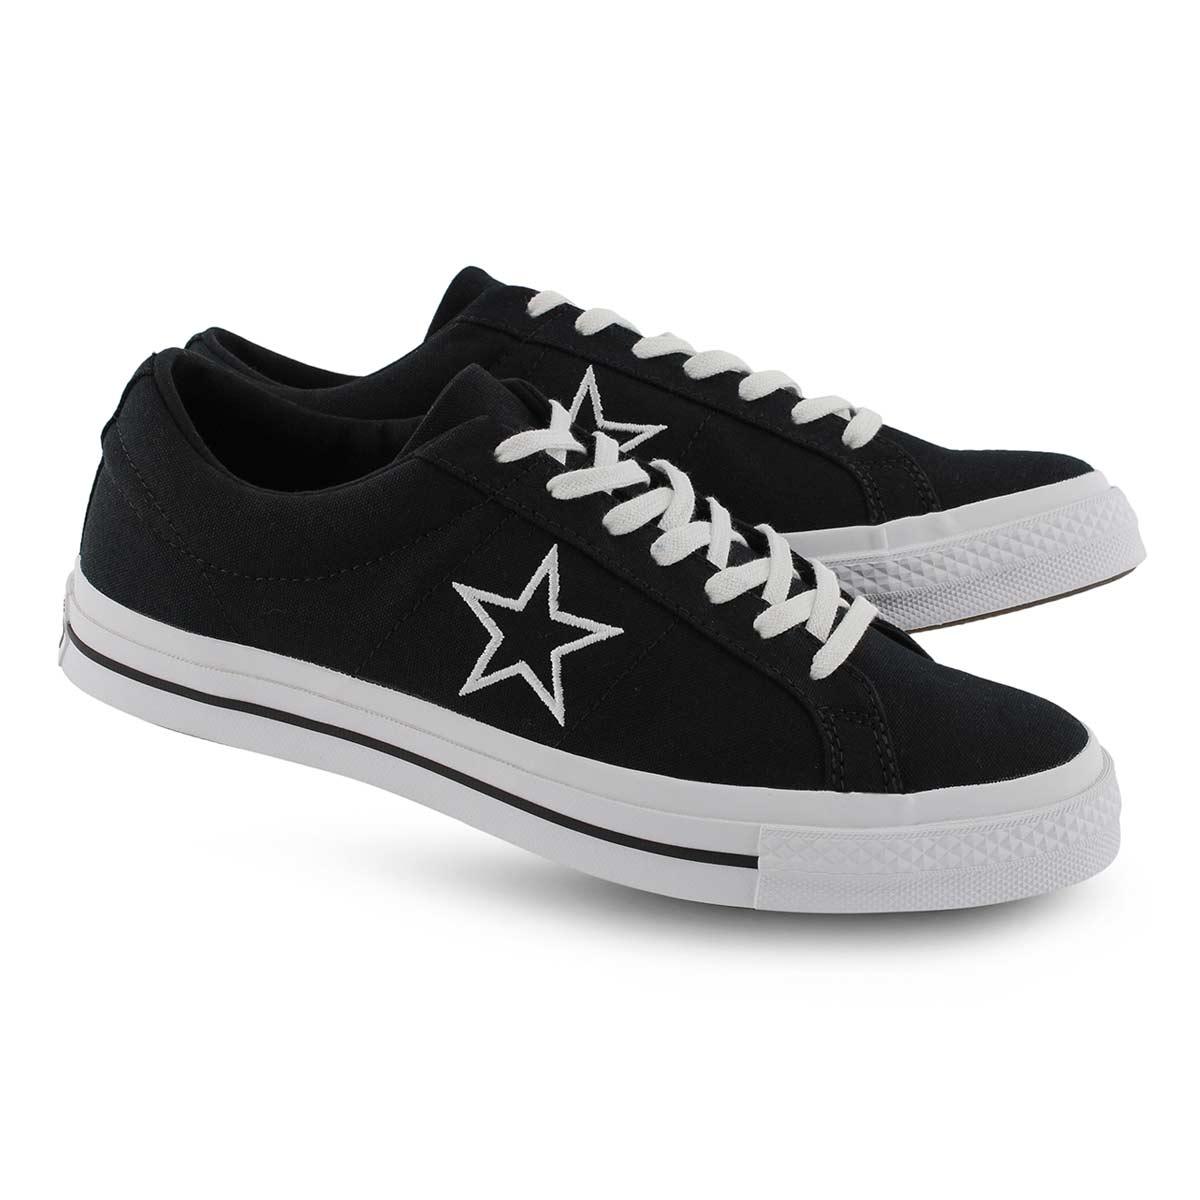 Espadrilles mode ONE STAR, noir/blanc, hommes